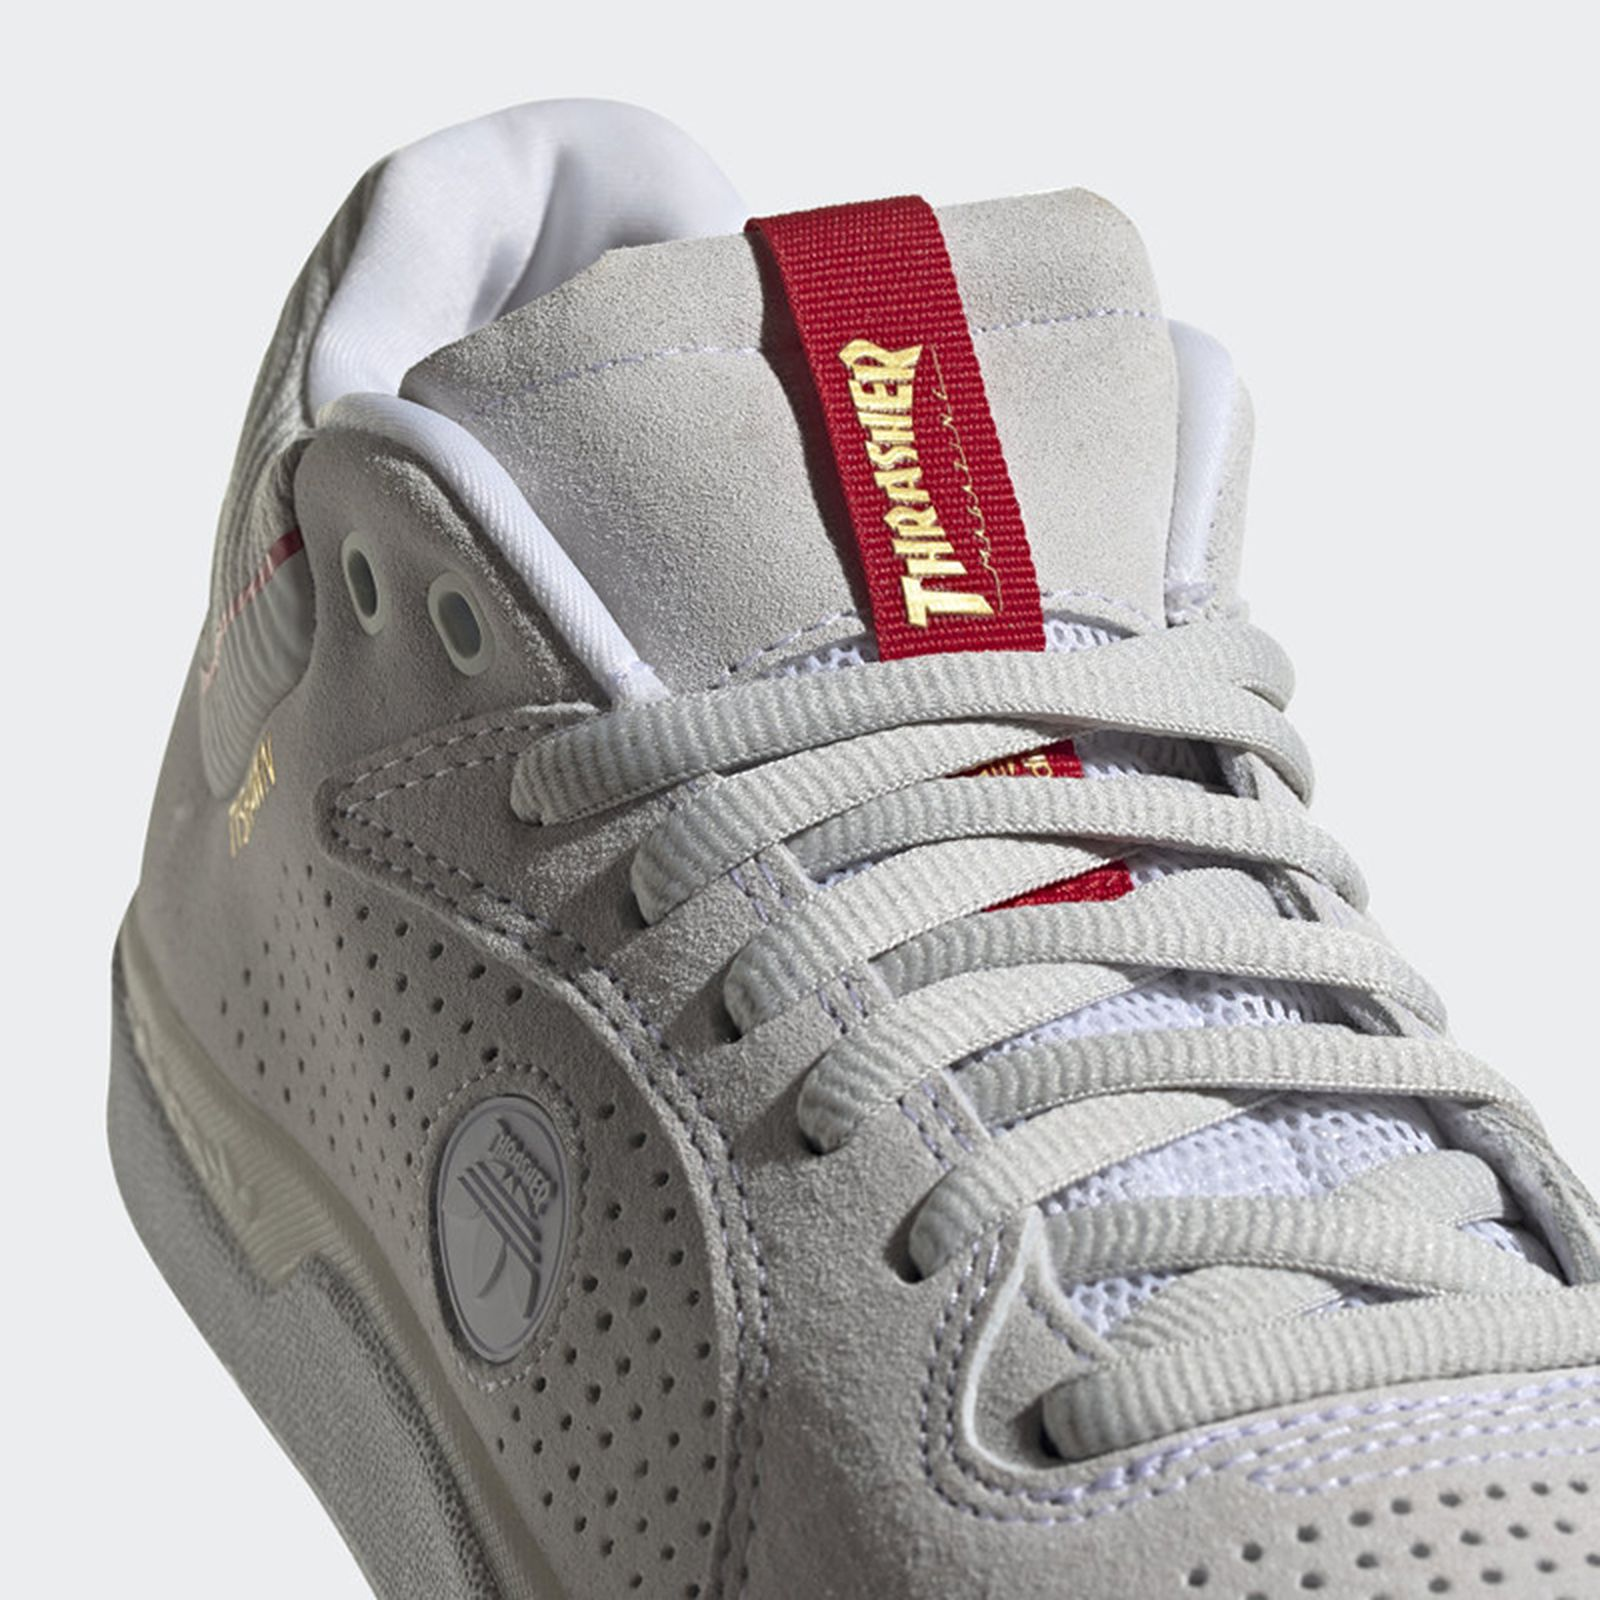 thrasher-adidas-superstar-adv-tyshawn-jones-release-date-price-1-13